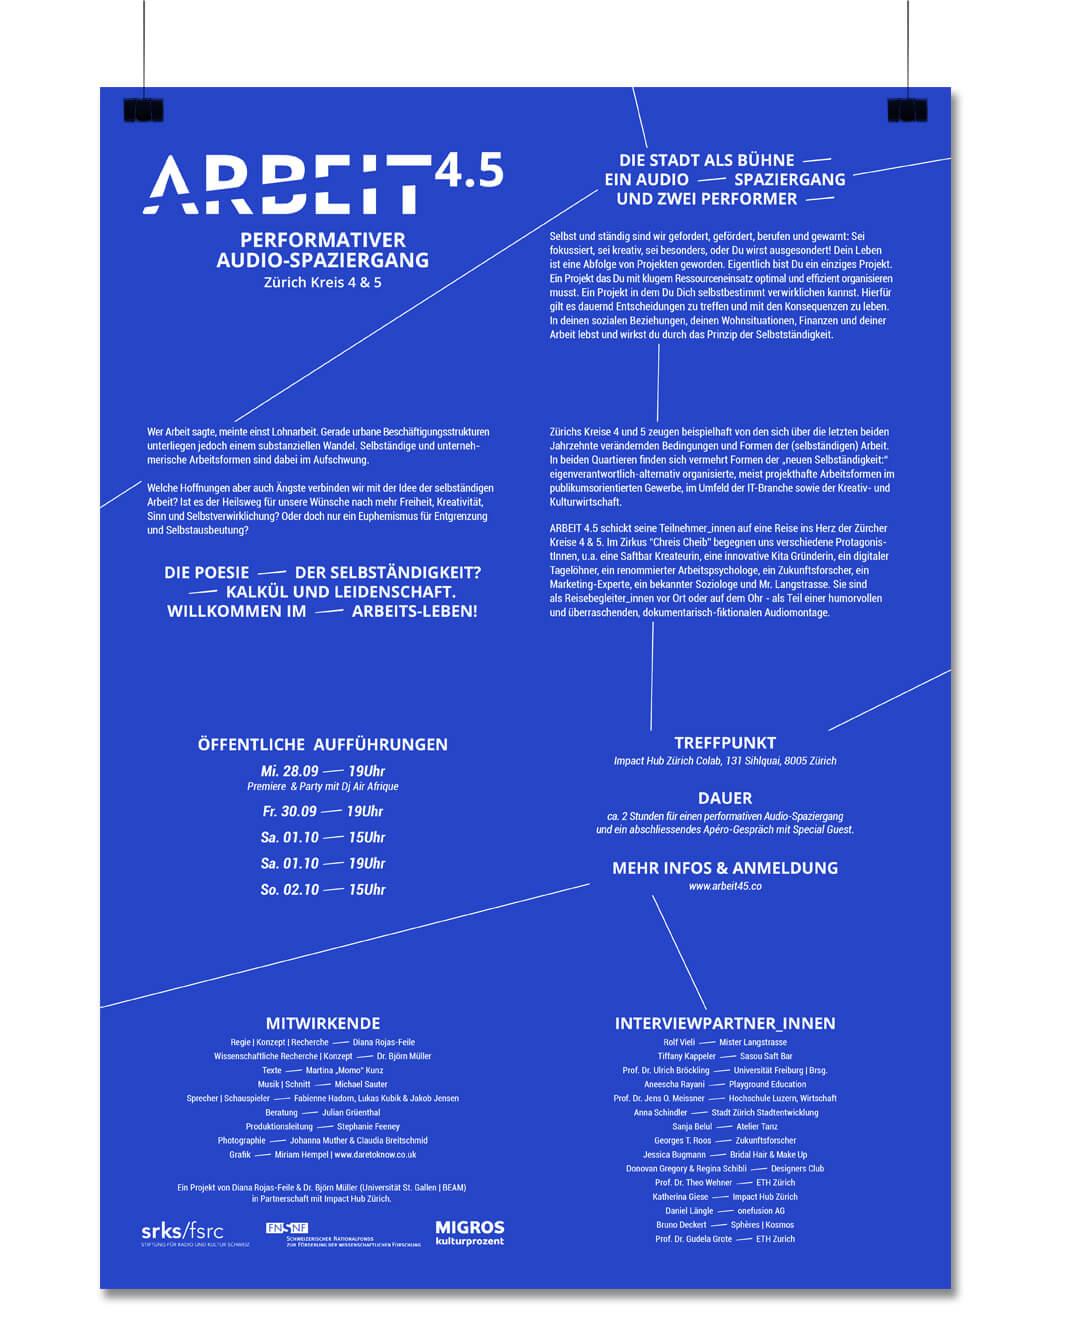 arbeit4-5_poster1